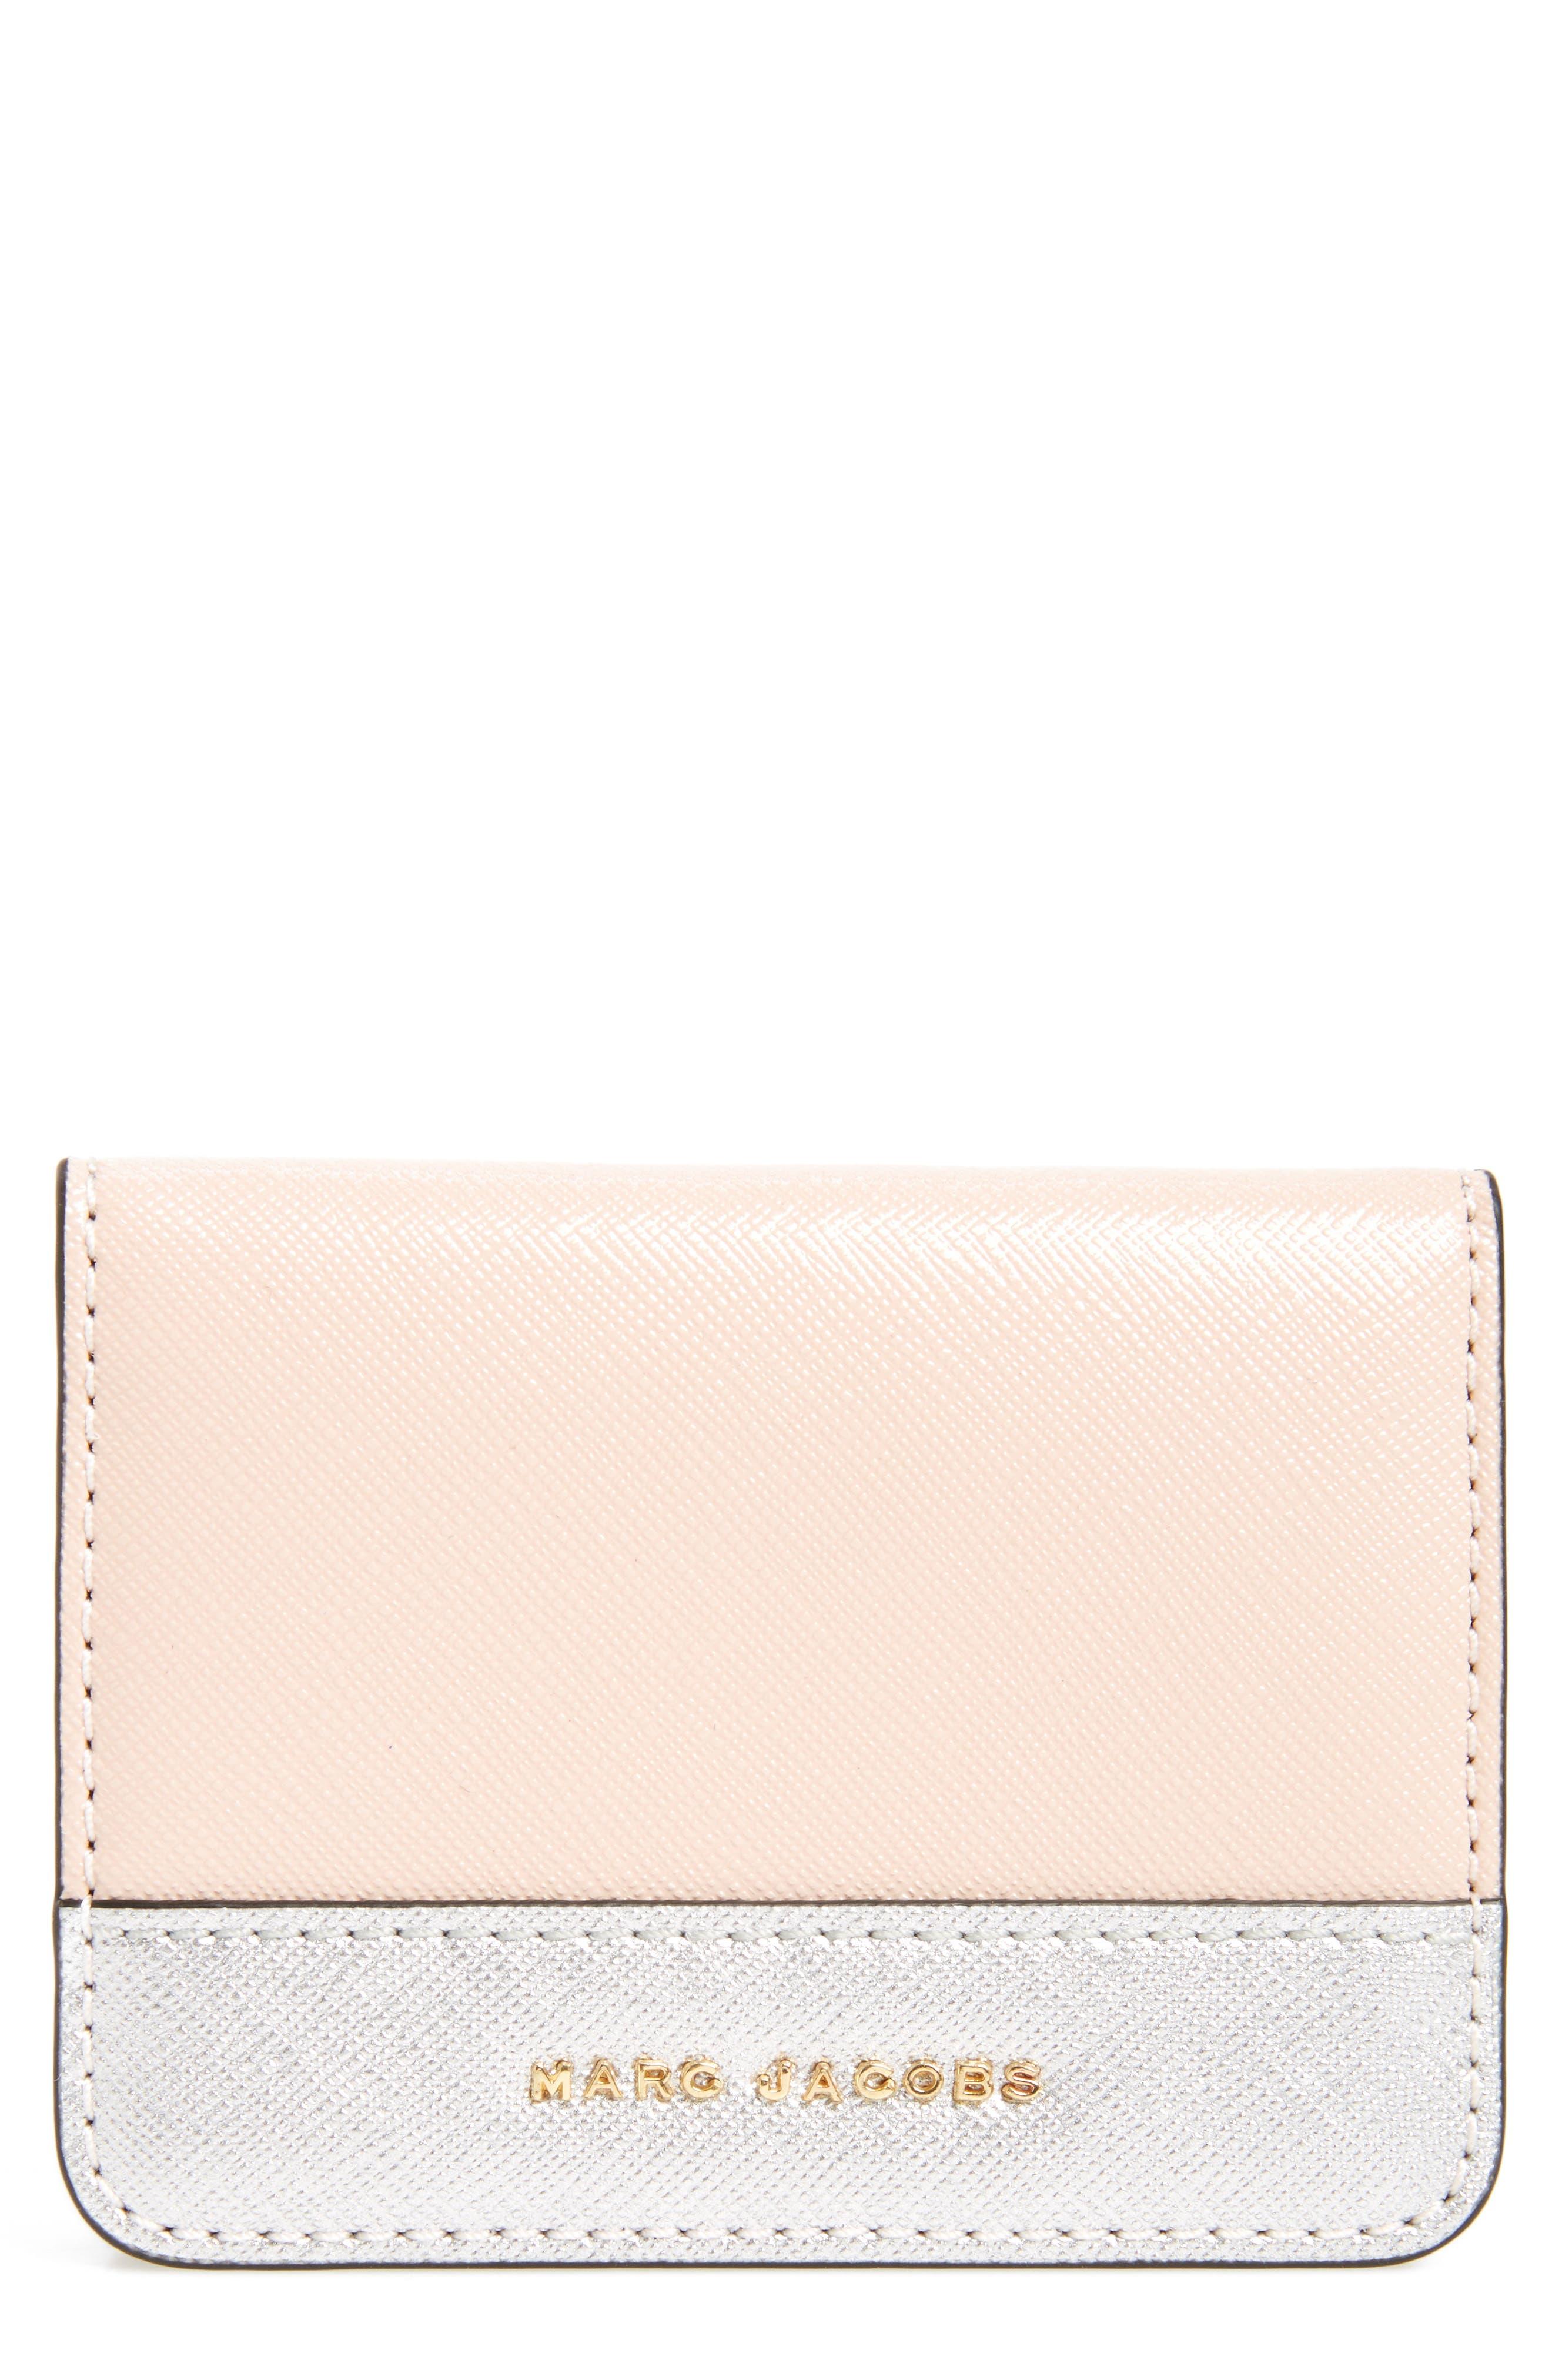 Color Block Saffiano Leather Business Card Case,                             Main thumbnail 1, color,                             Pale Pink Multi